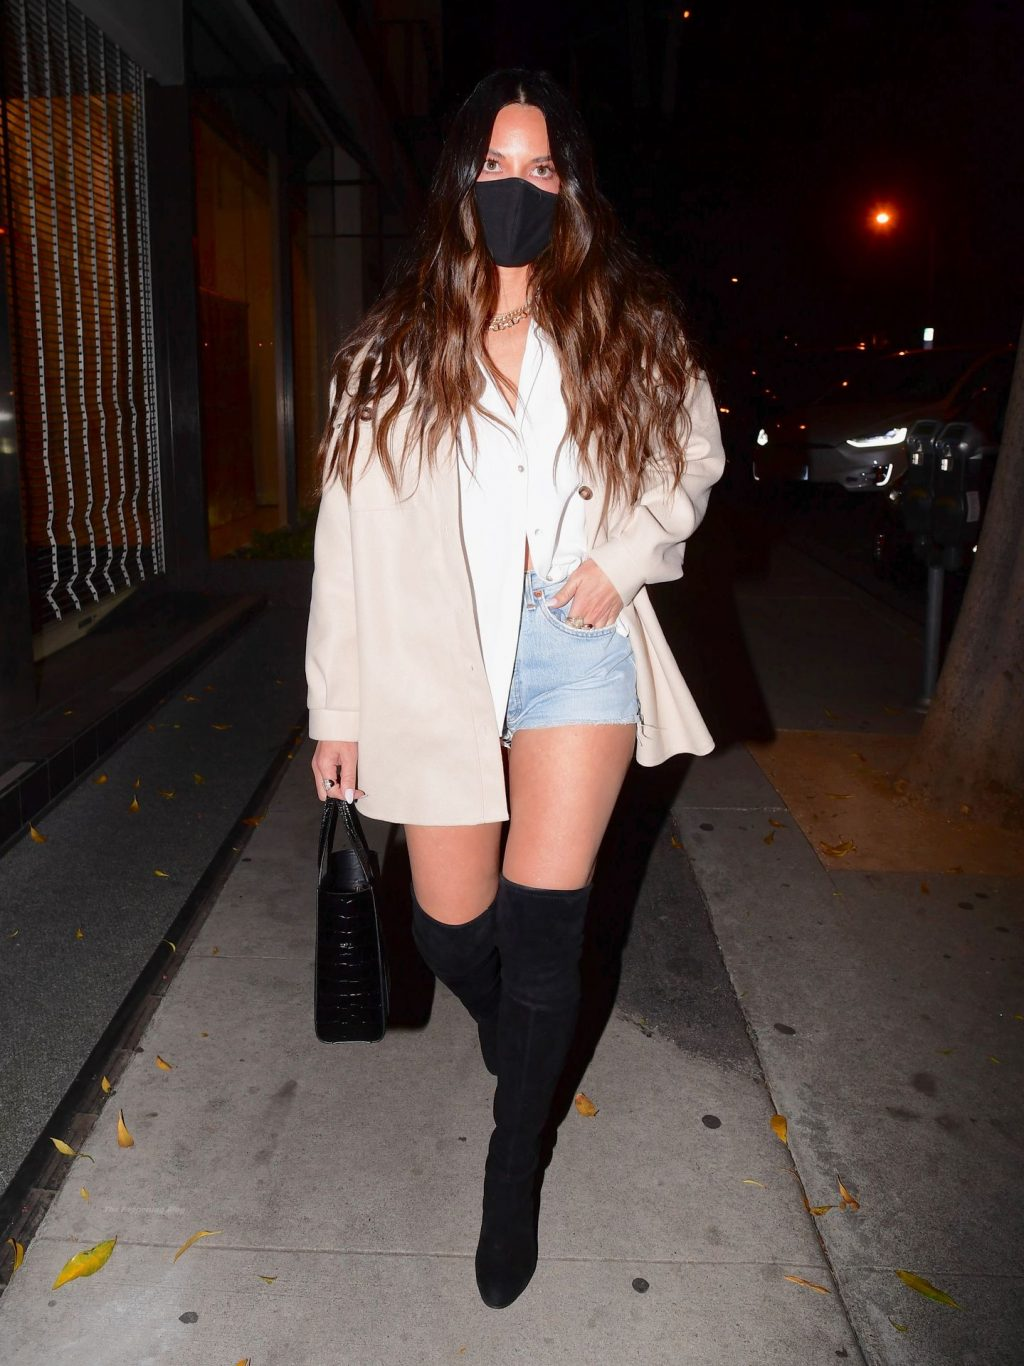 Olivia Munn Puts on a Leggy Display in New York (37 Photos)